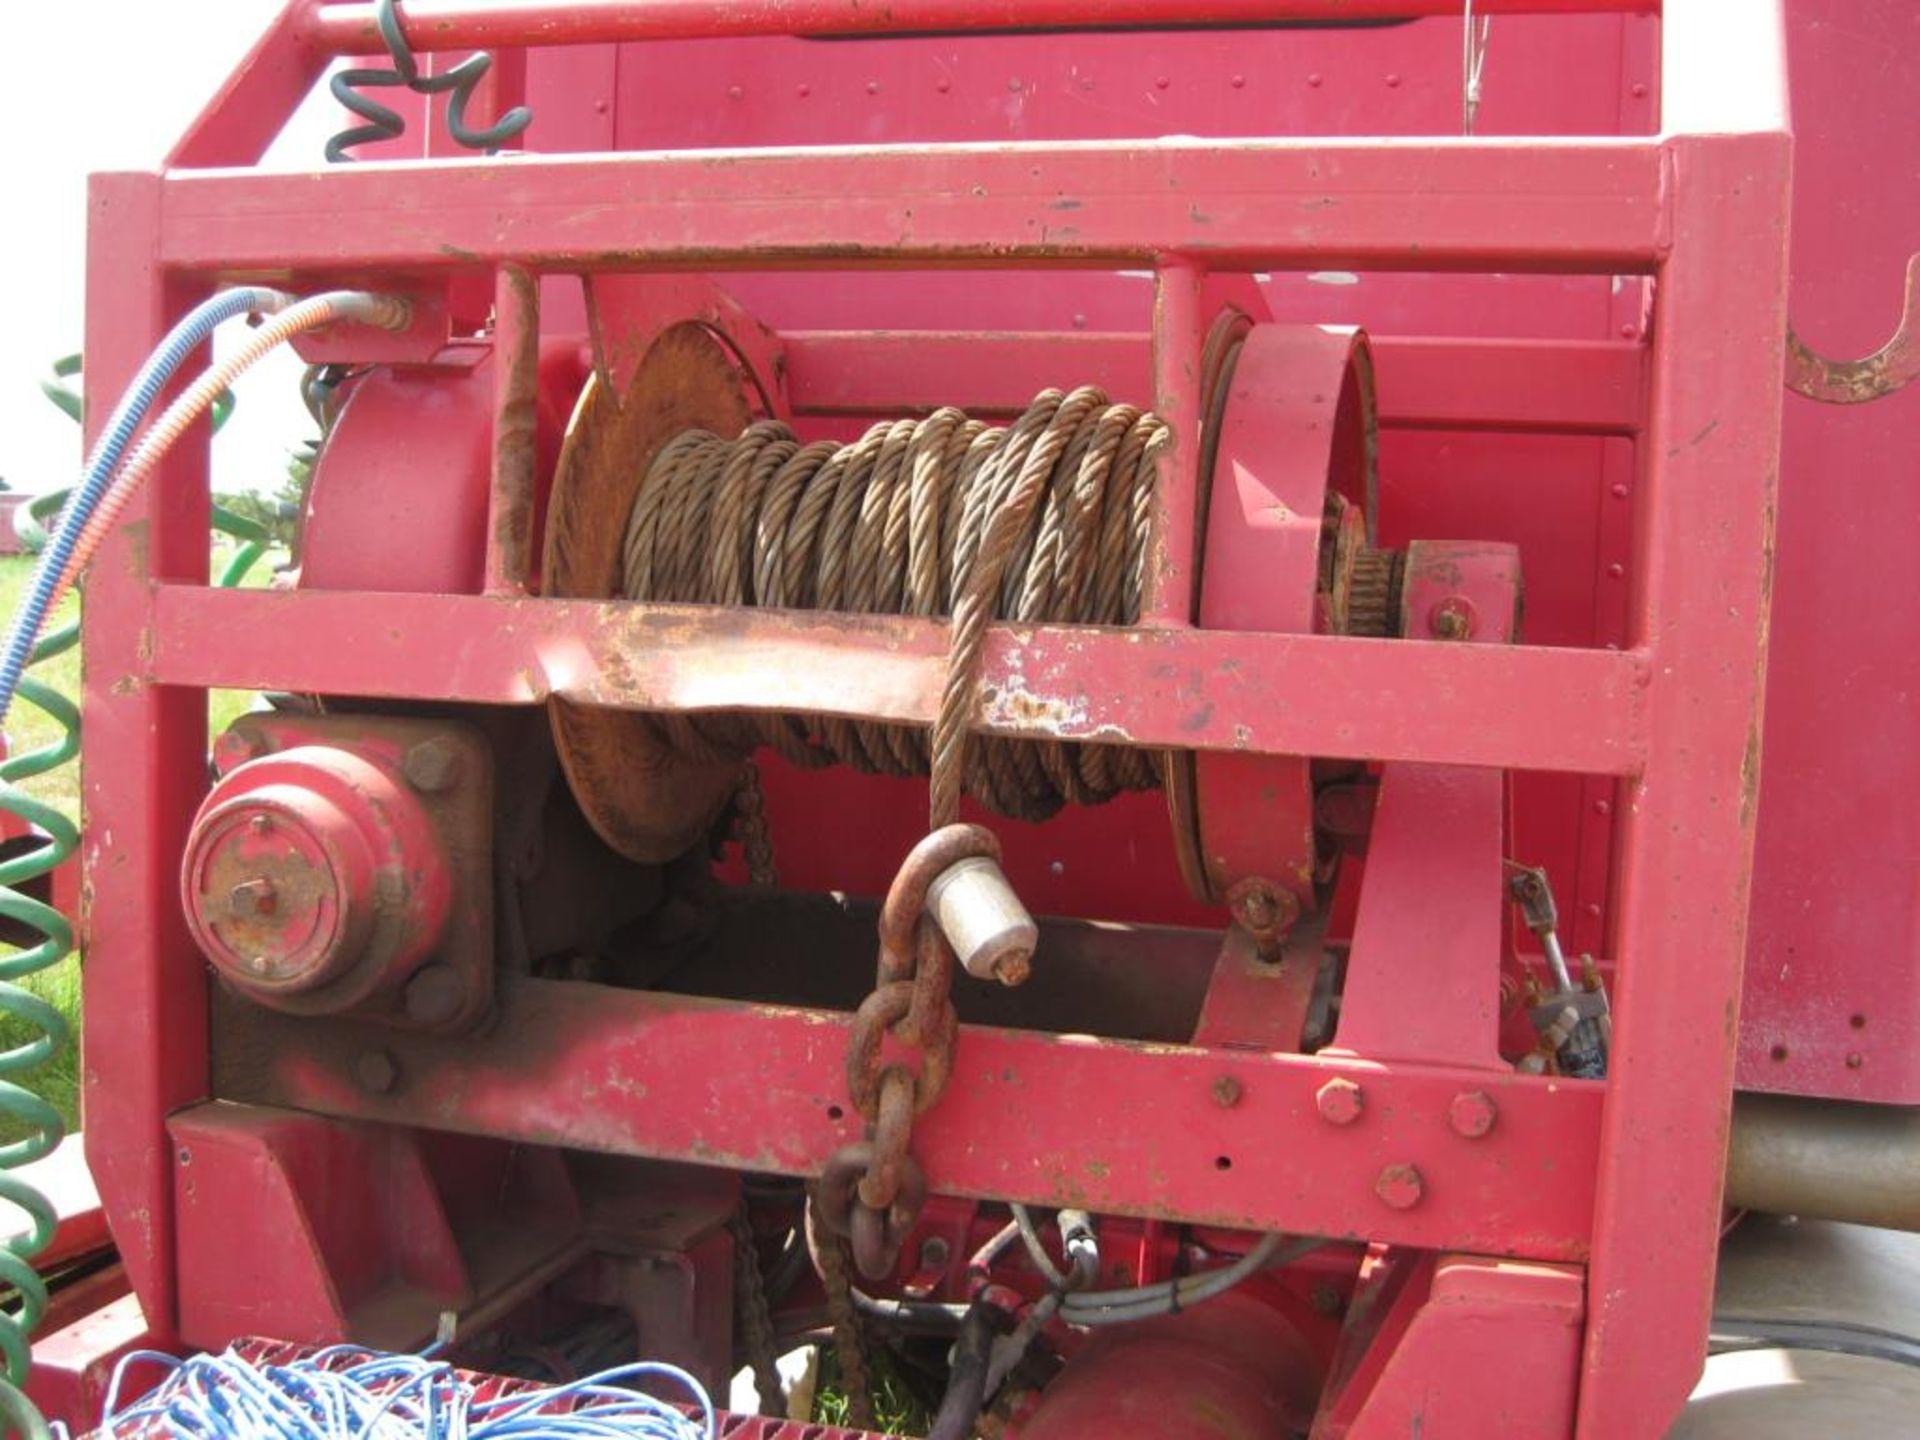 Kenworth Winch Truck - Image 10 of 23